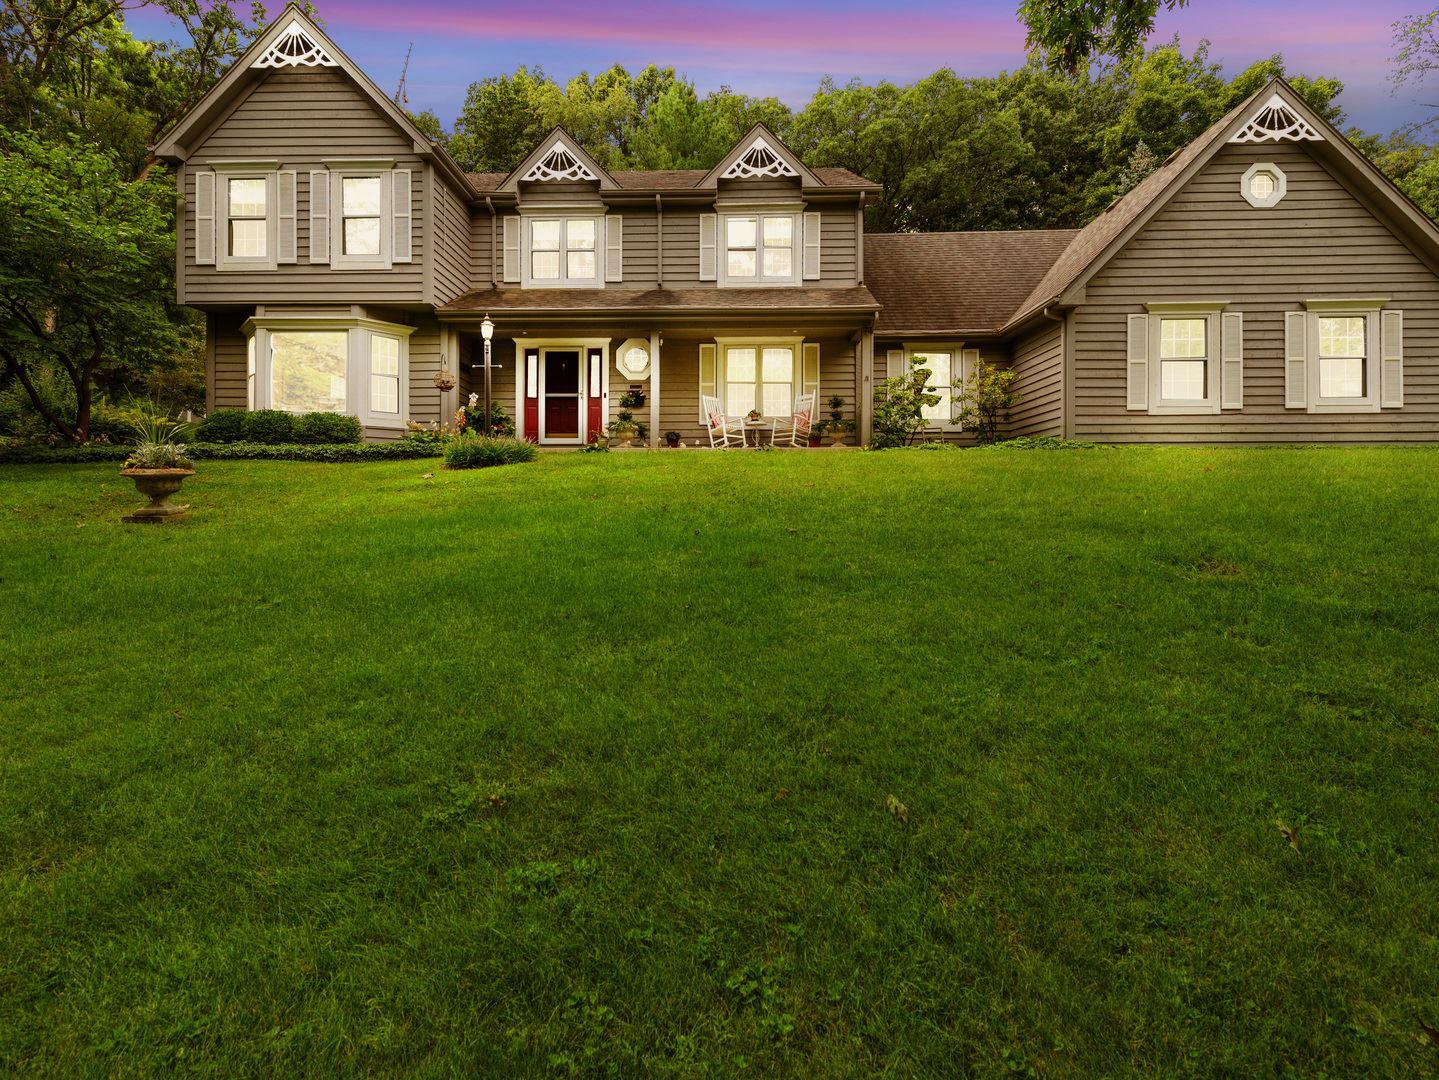 3717 Lindsay Lane, Crystal Lake, IL 60014 - #: 11199311